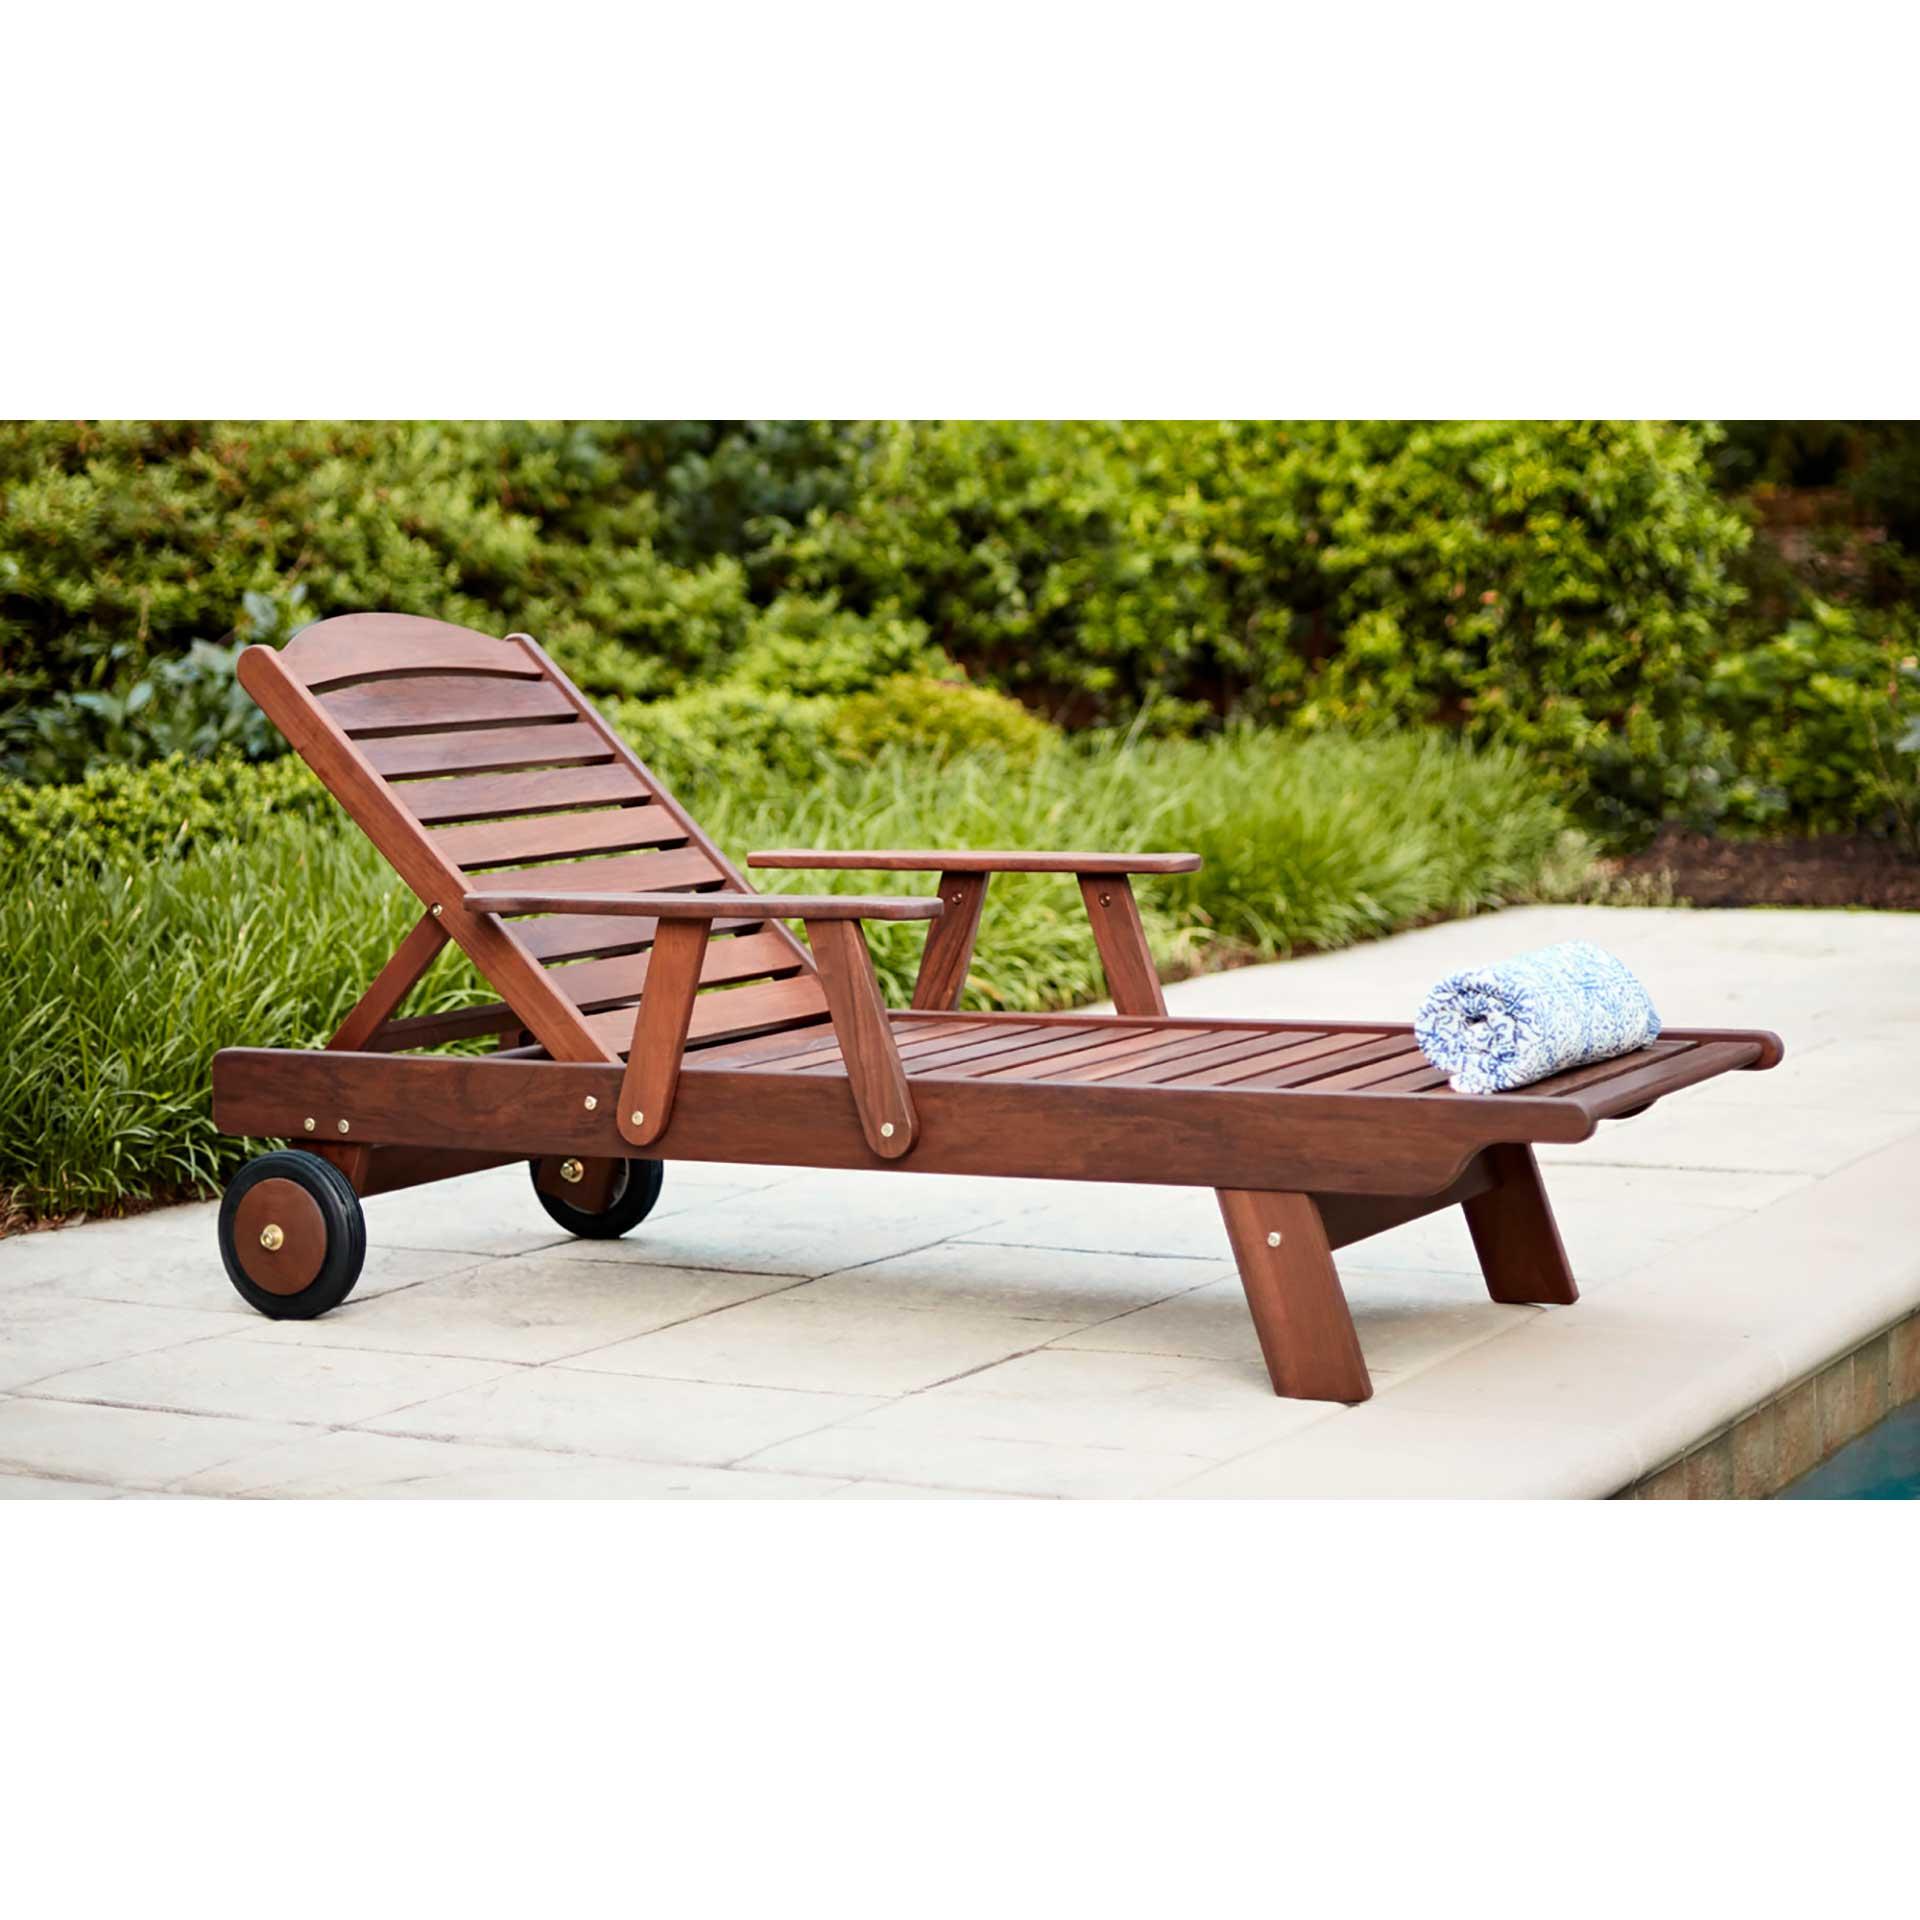 Jensen Leisure Ipe Adirondack Chair Outdoor Furniture